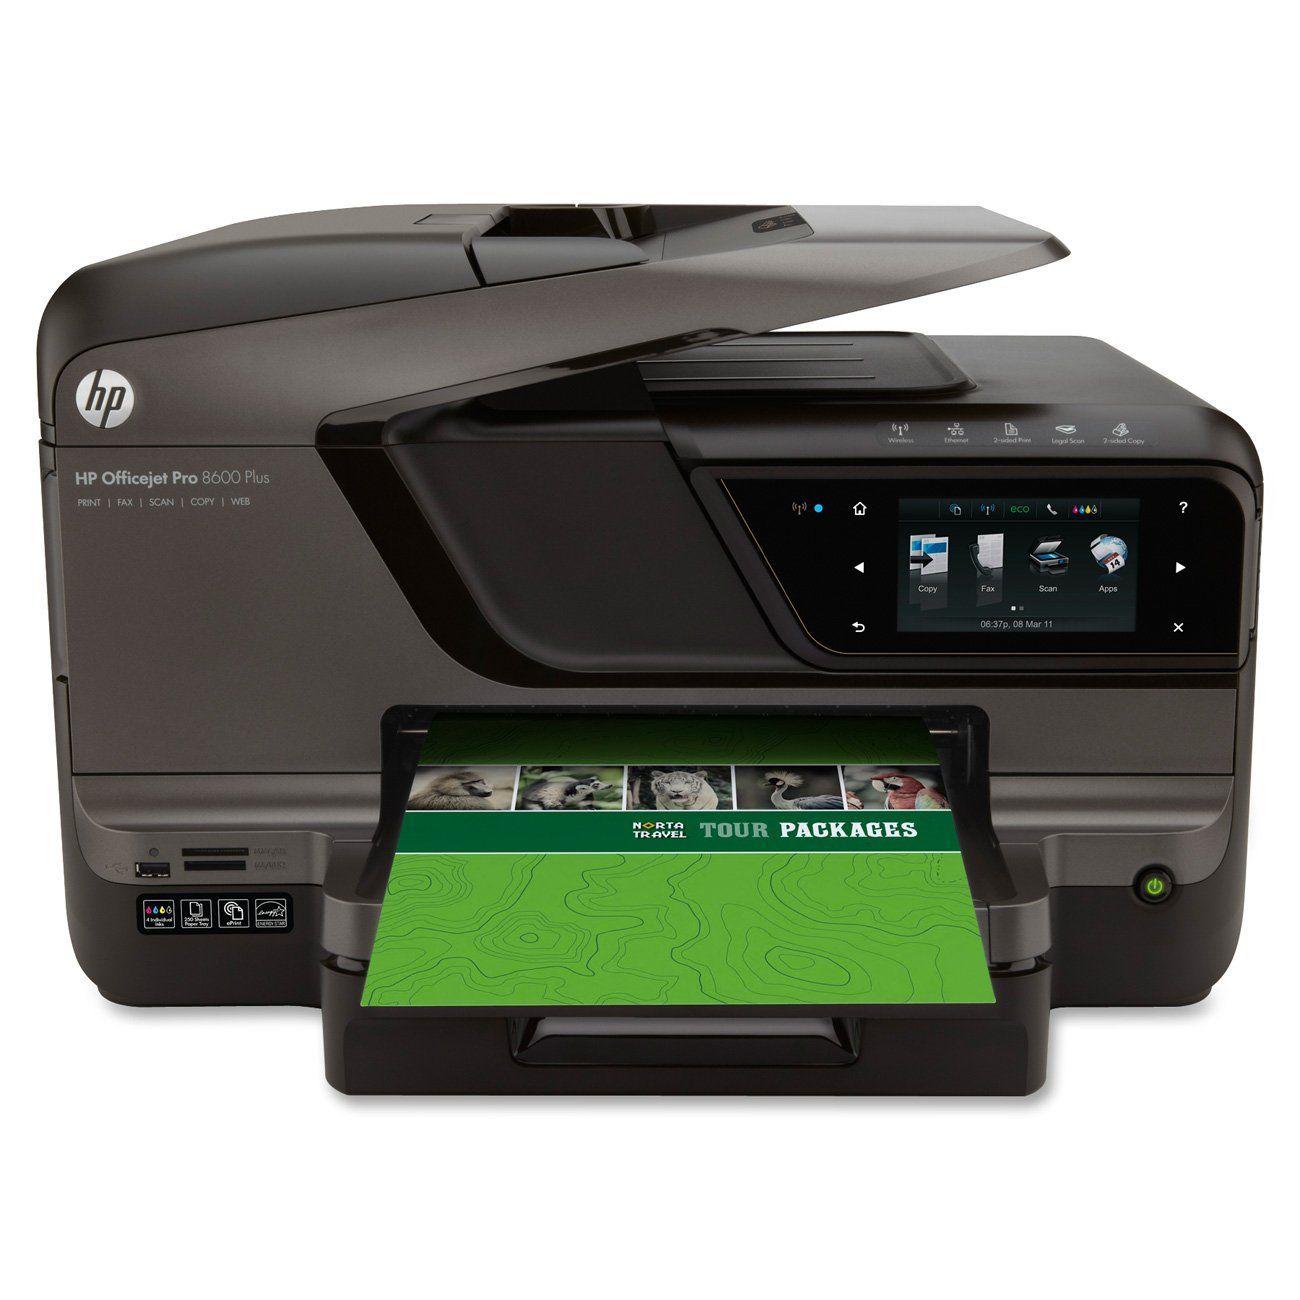 Color printer wireless - Hp Officejet Pro 8600 Plus E All In One Wireless Color Printer With